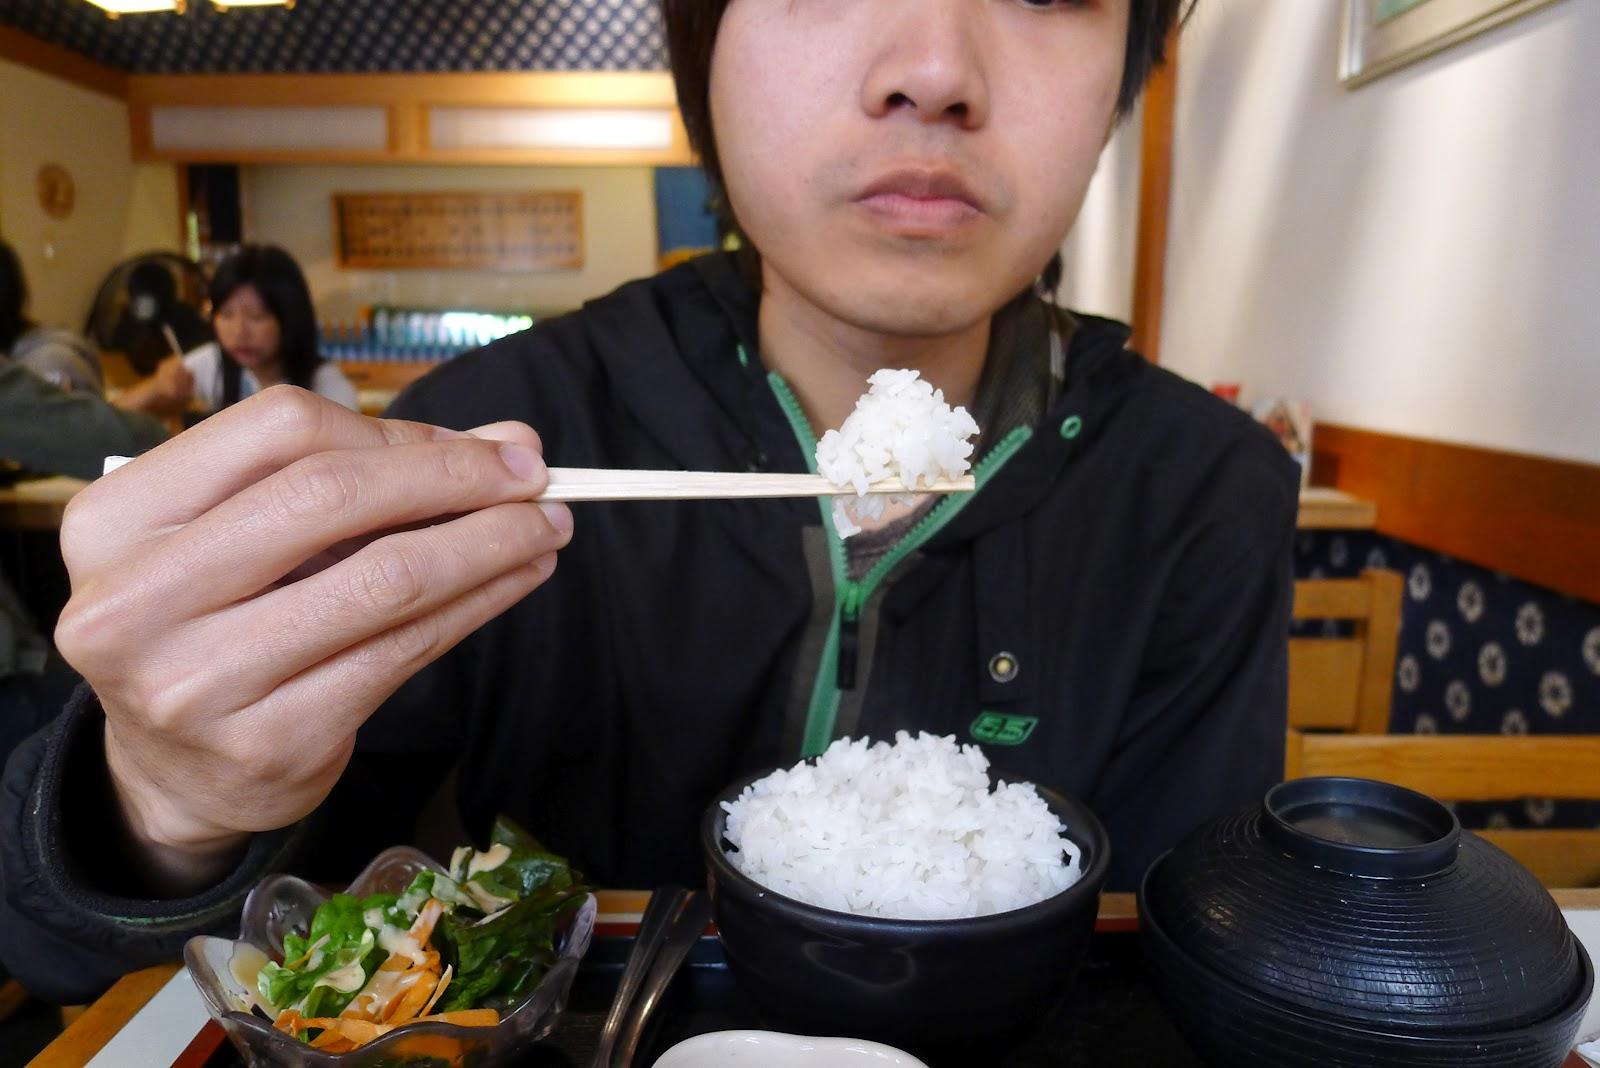 4 Rahasia Masyarakat Jepang Berumur Panjang